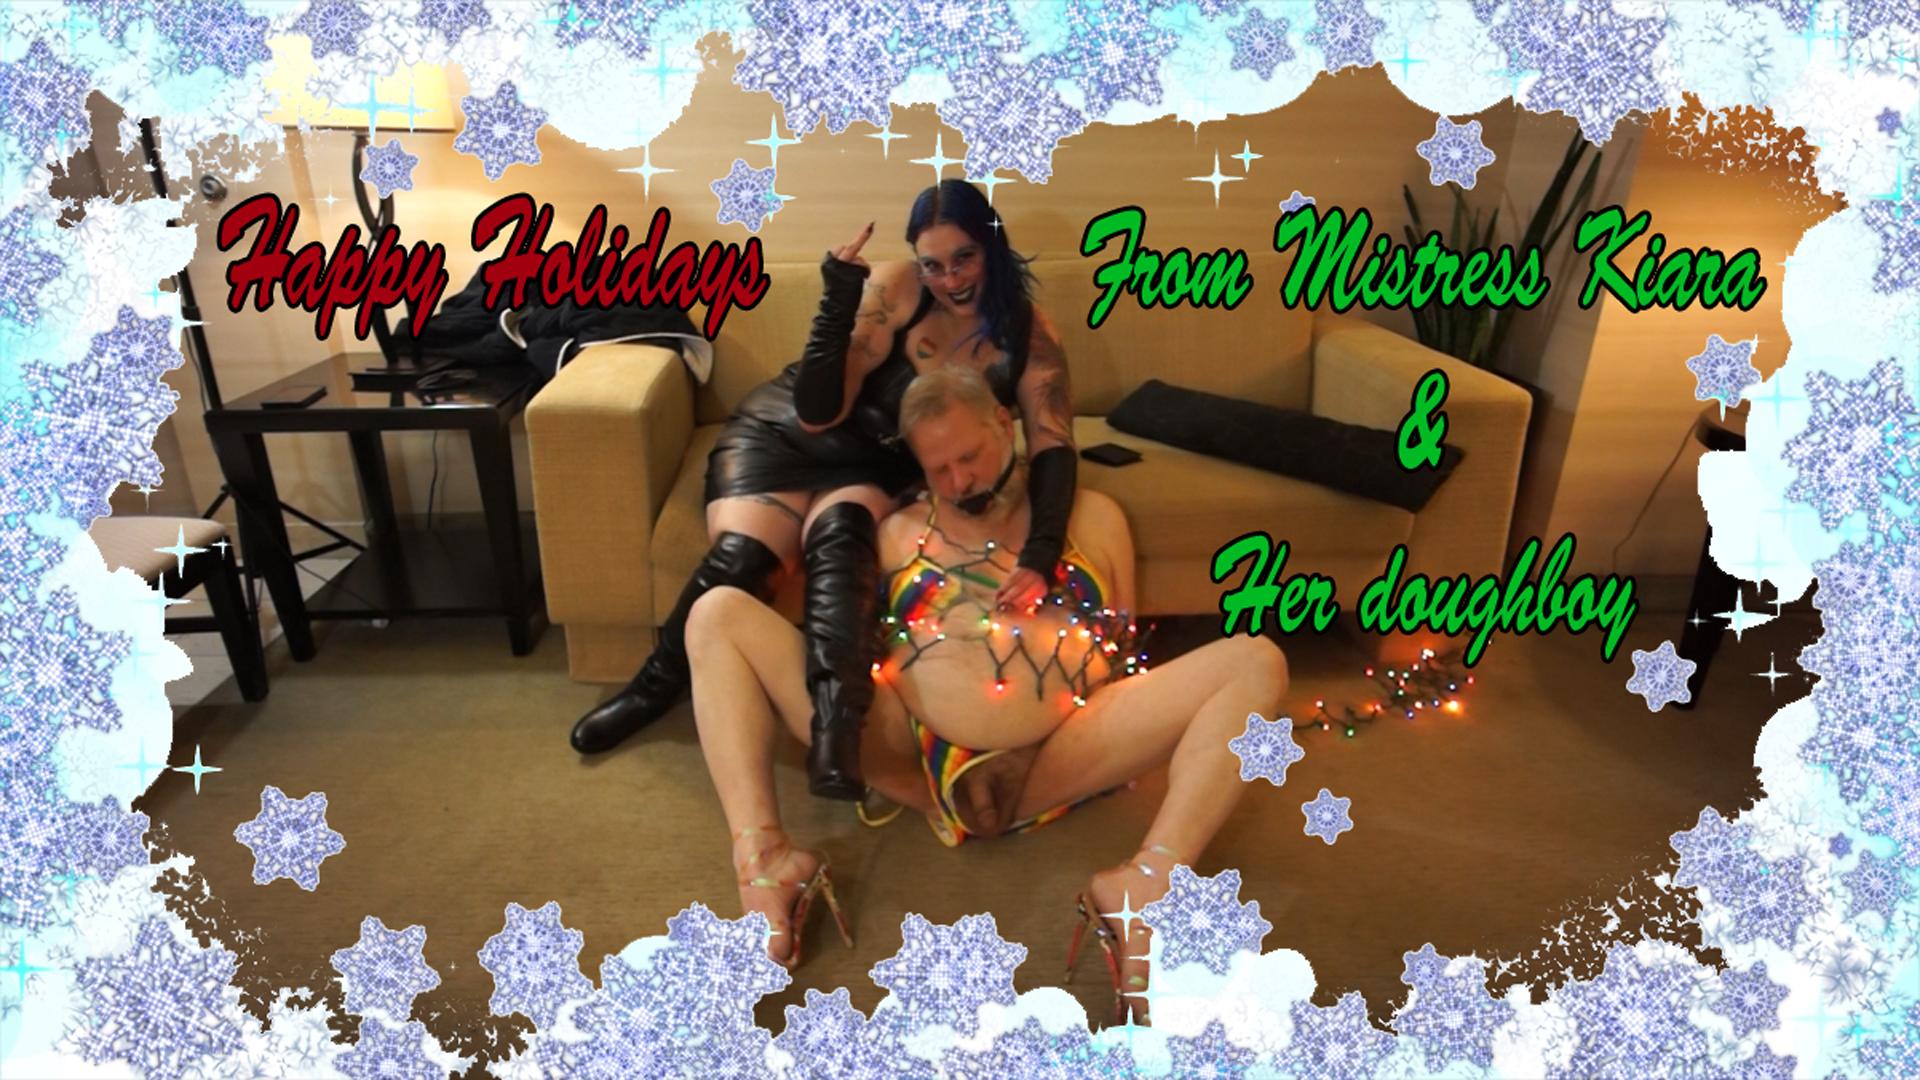 holiday femdom Mistress humiliation fetish